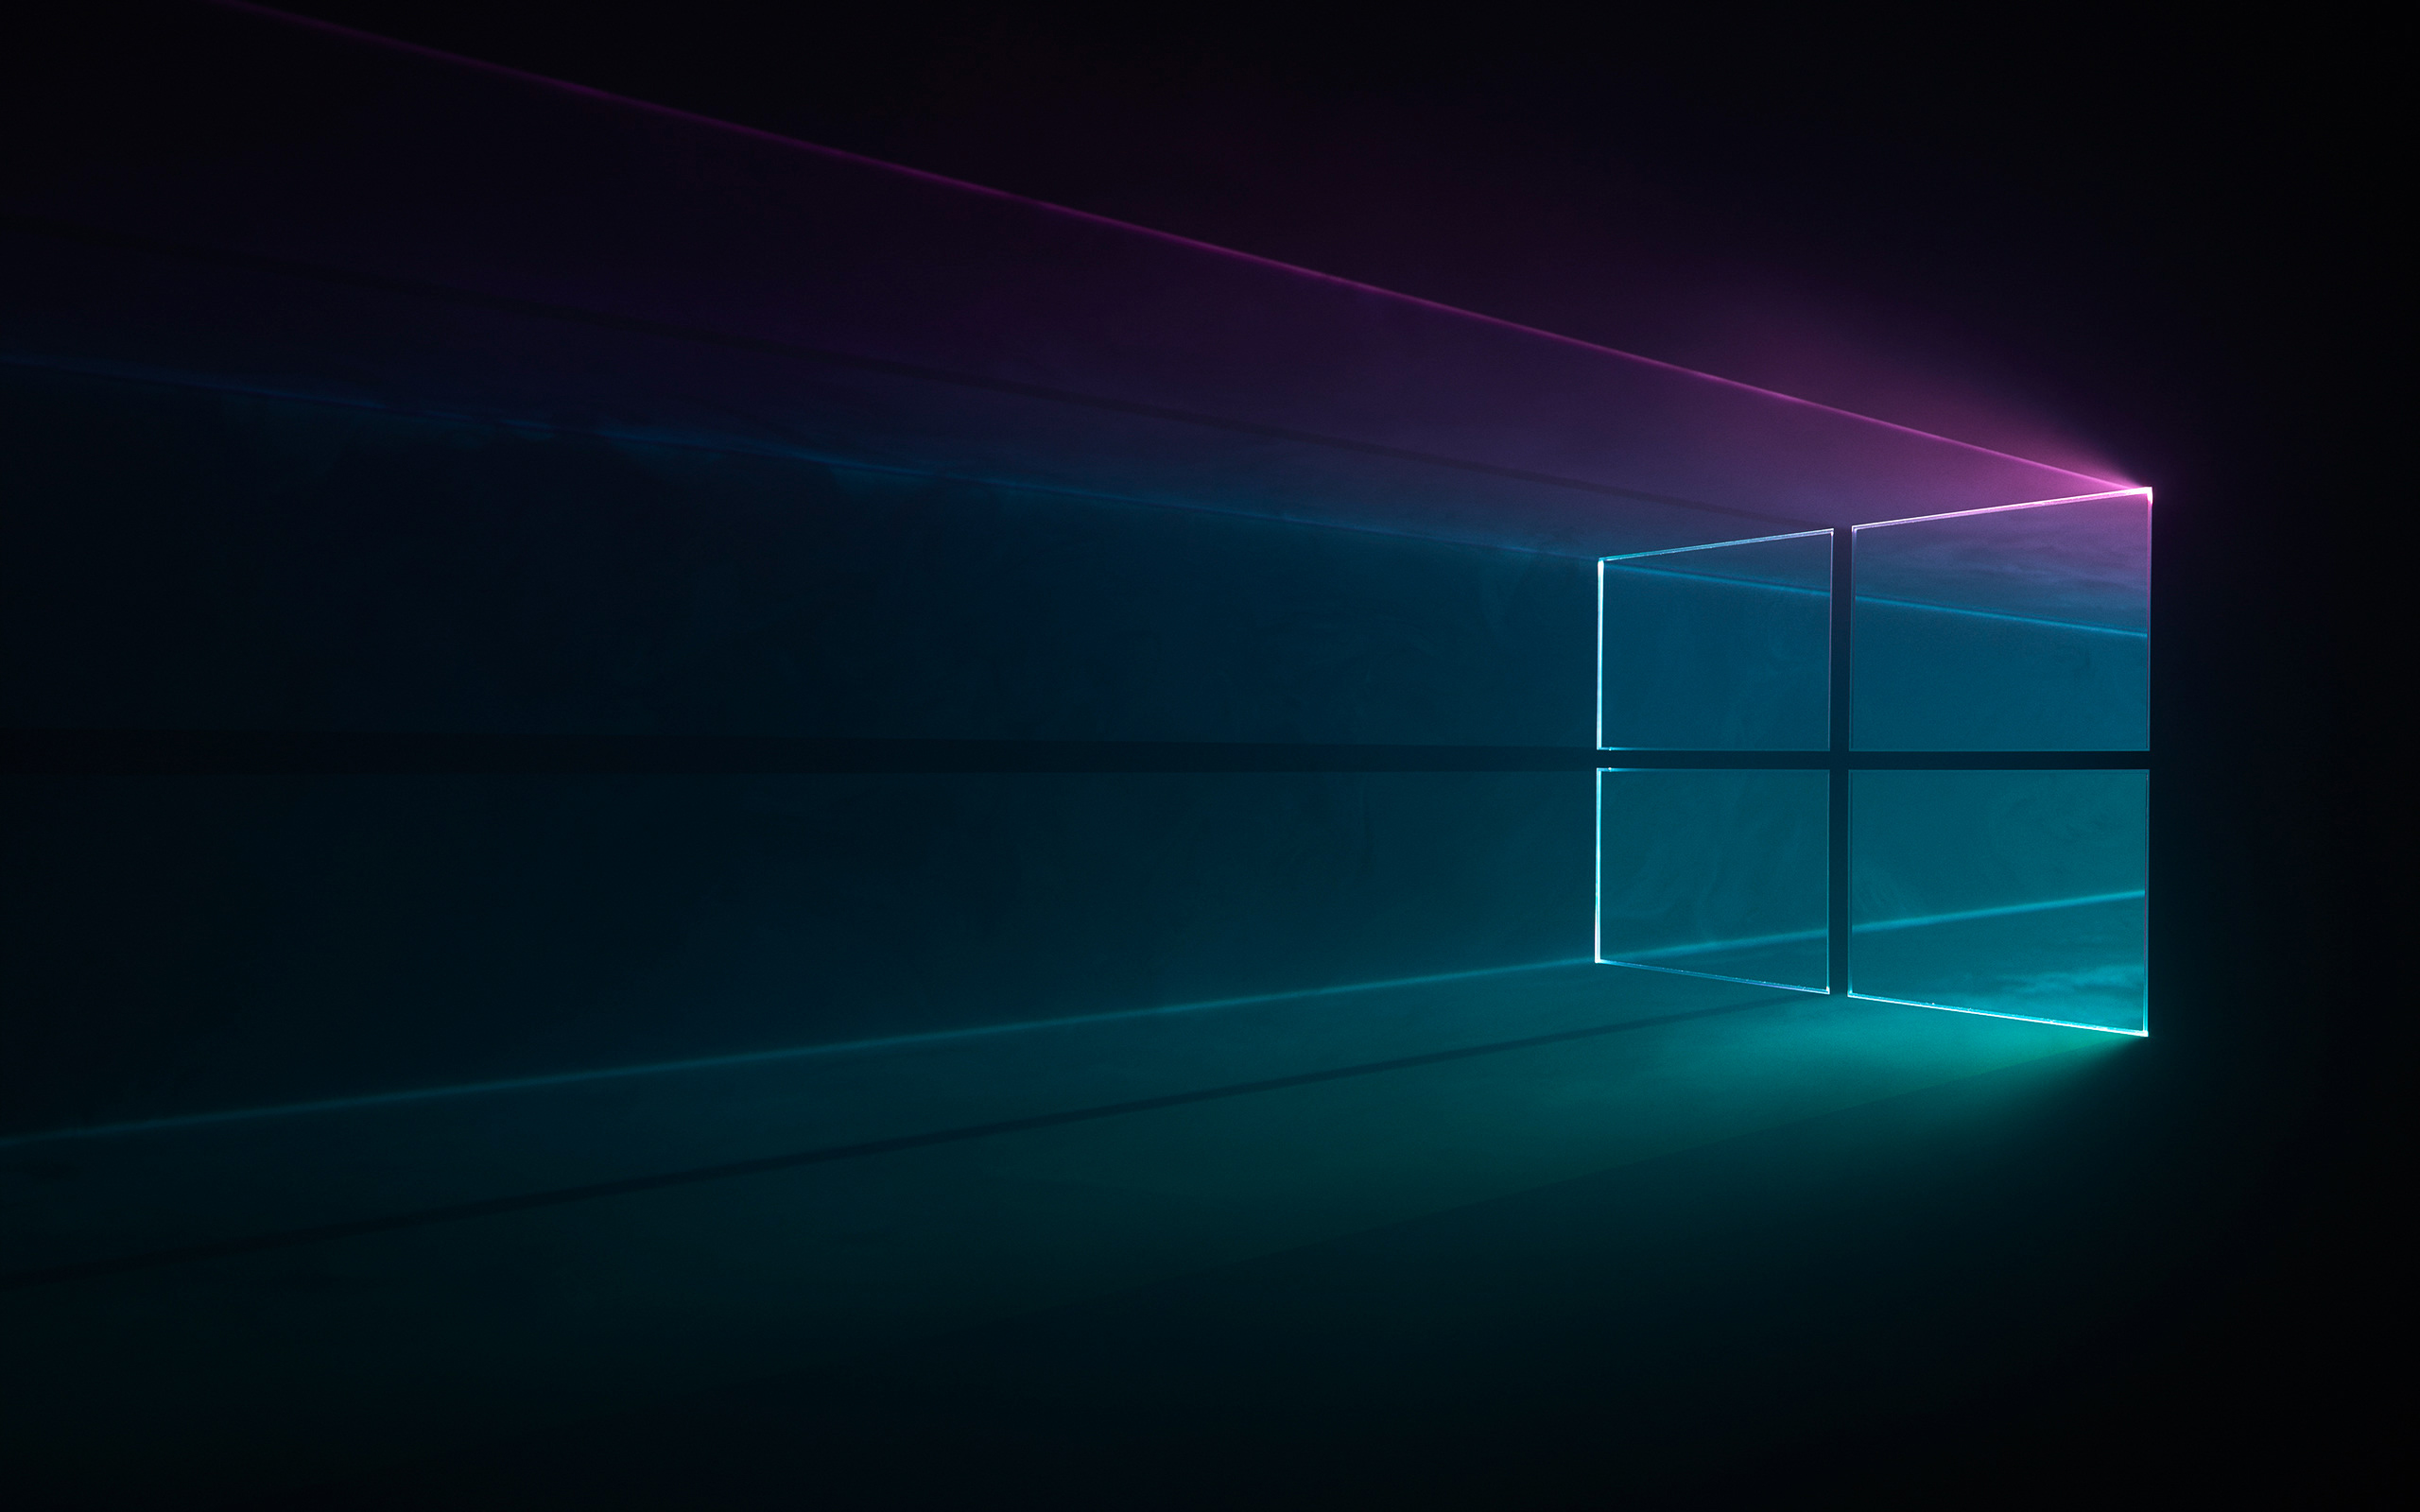 Windows 10 1 Wallpapers Wallpapers Hd